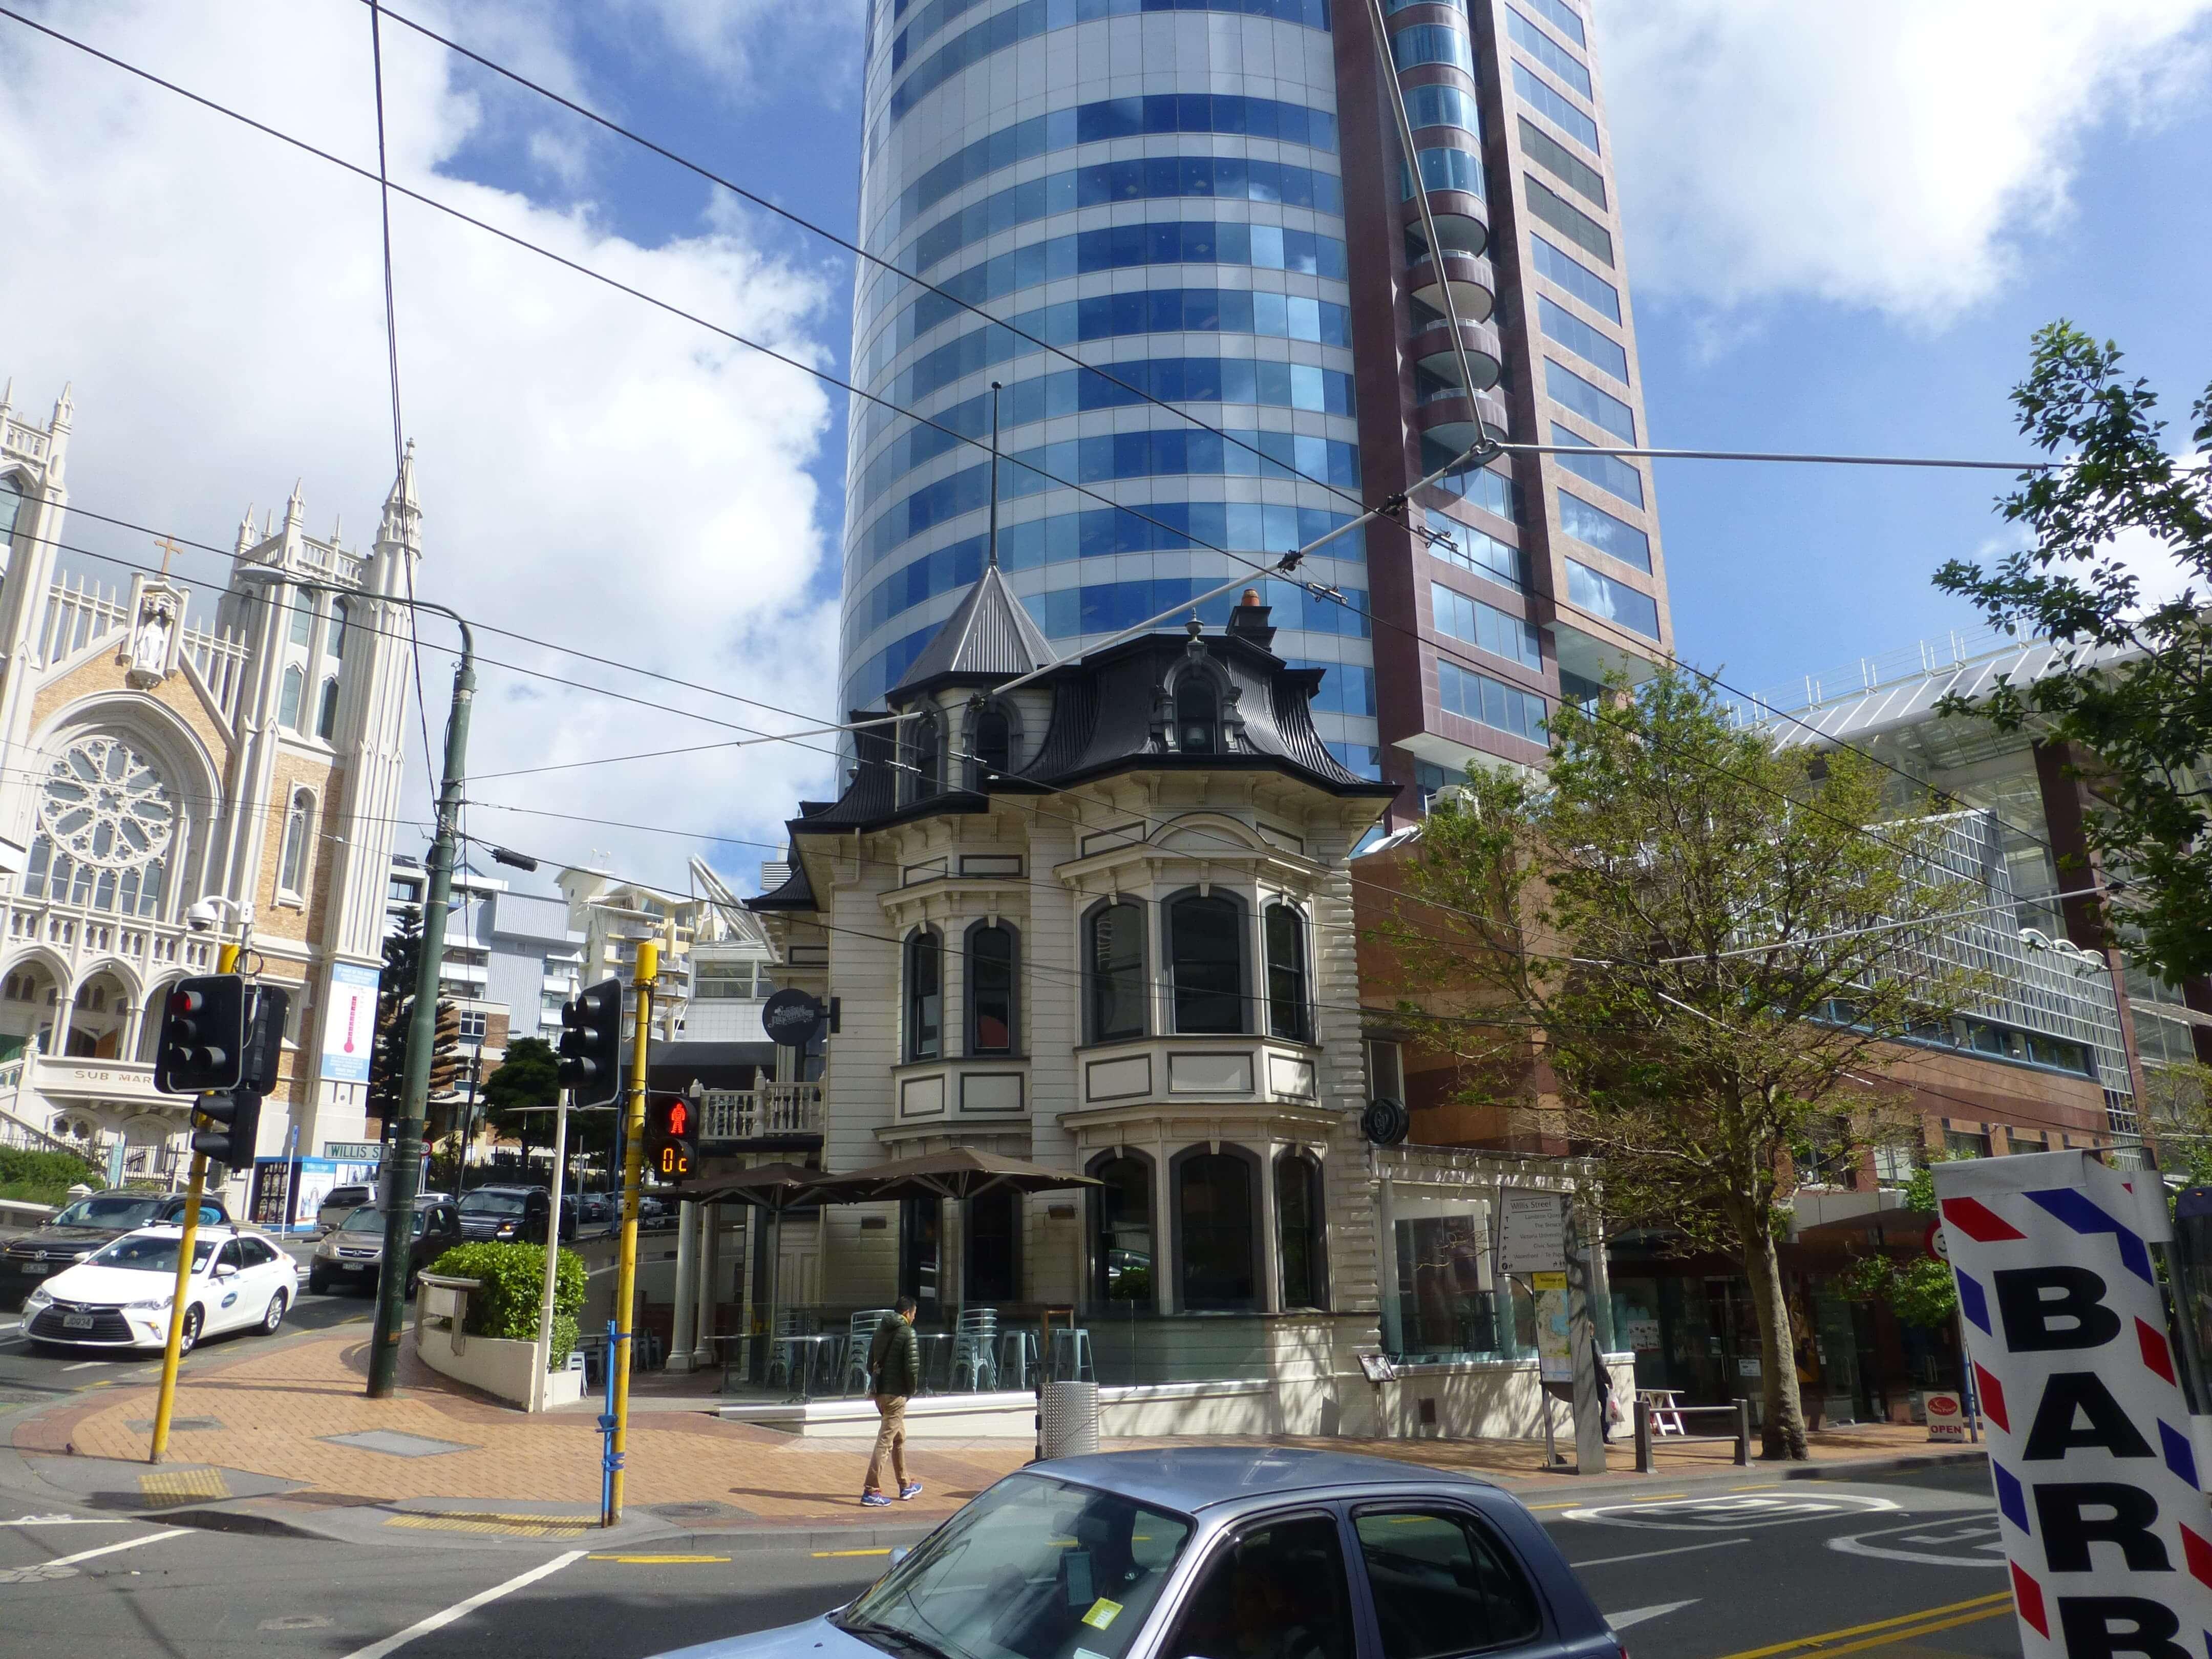 im Zentrum, Wellington, Neuseeland, Weit-weg.reisen 21